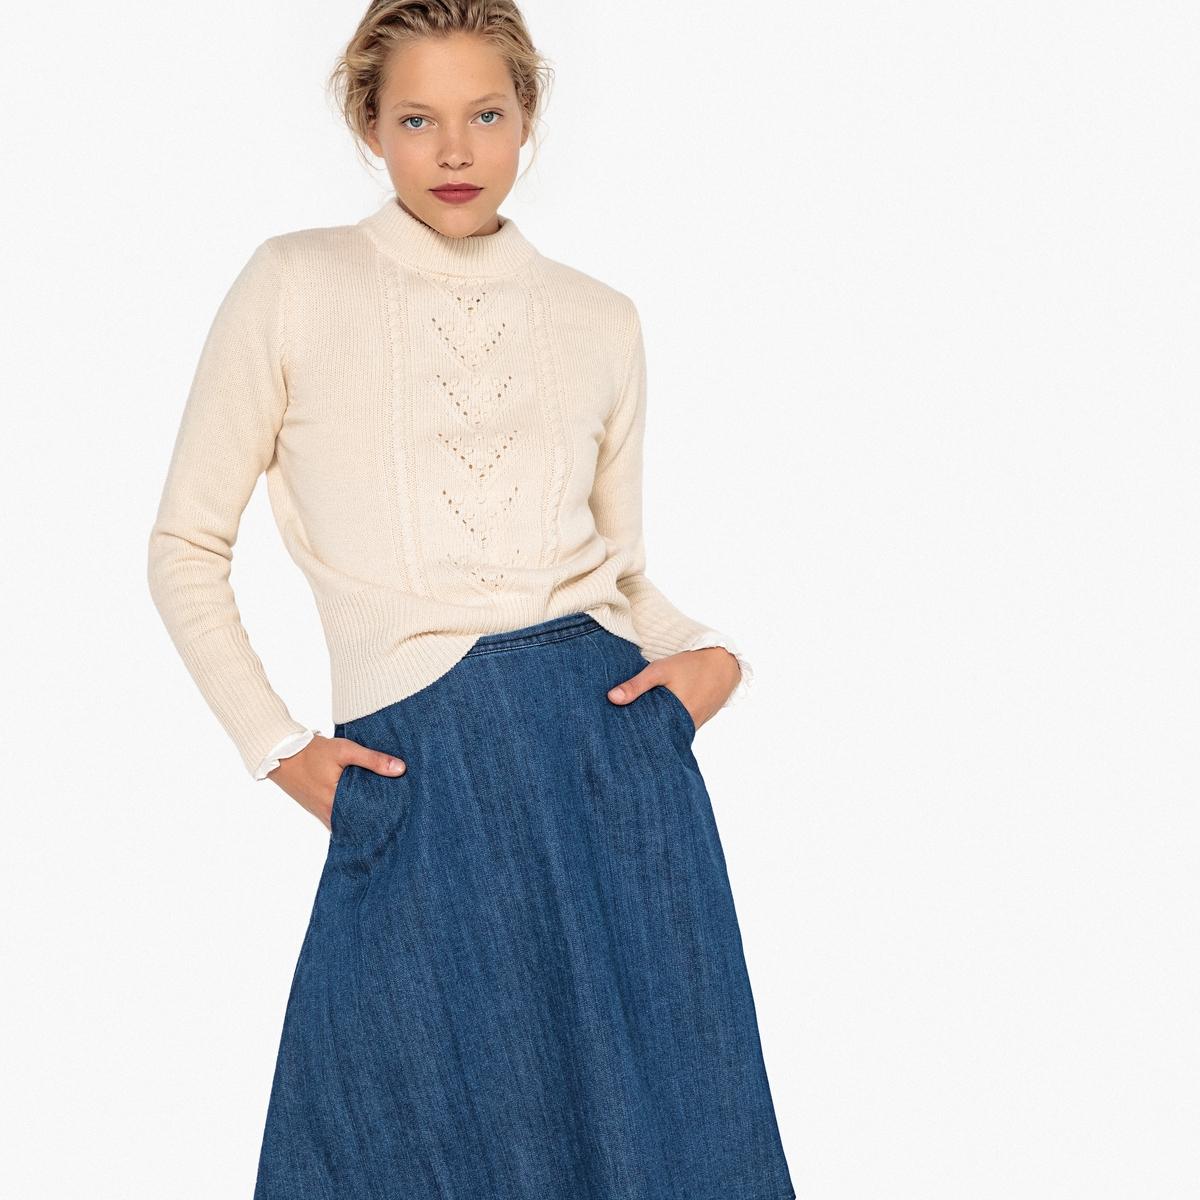 Пуловер с круглым вырезом, из шерсти MADEMOISELLE R